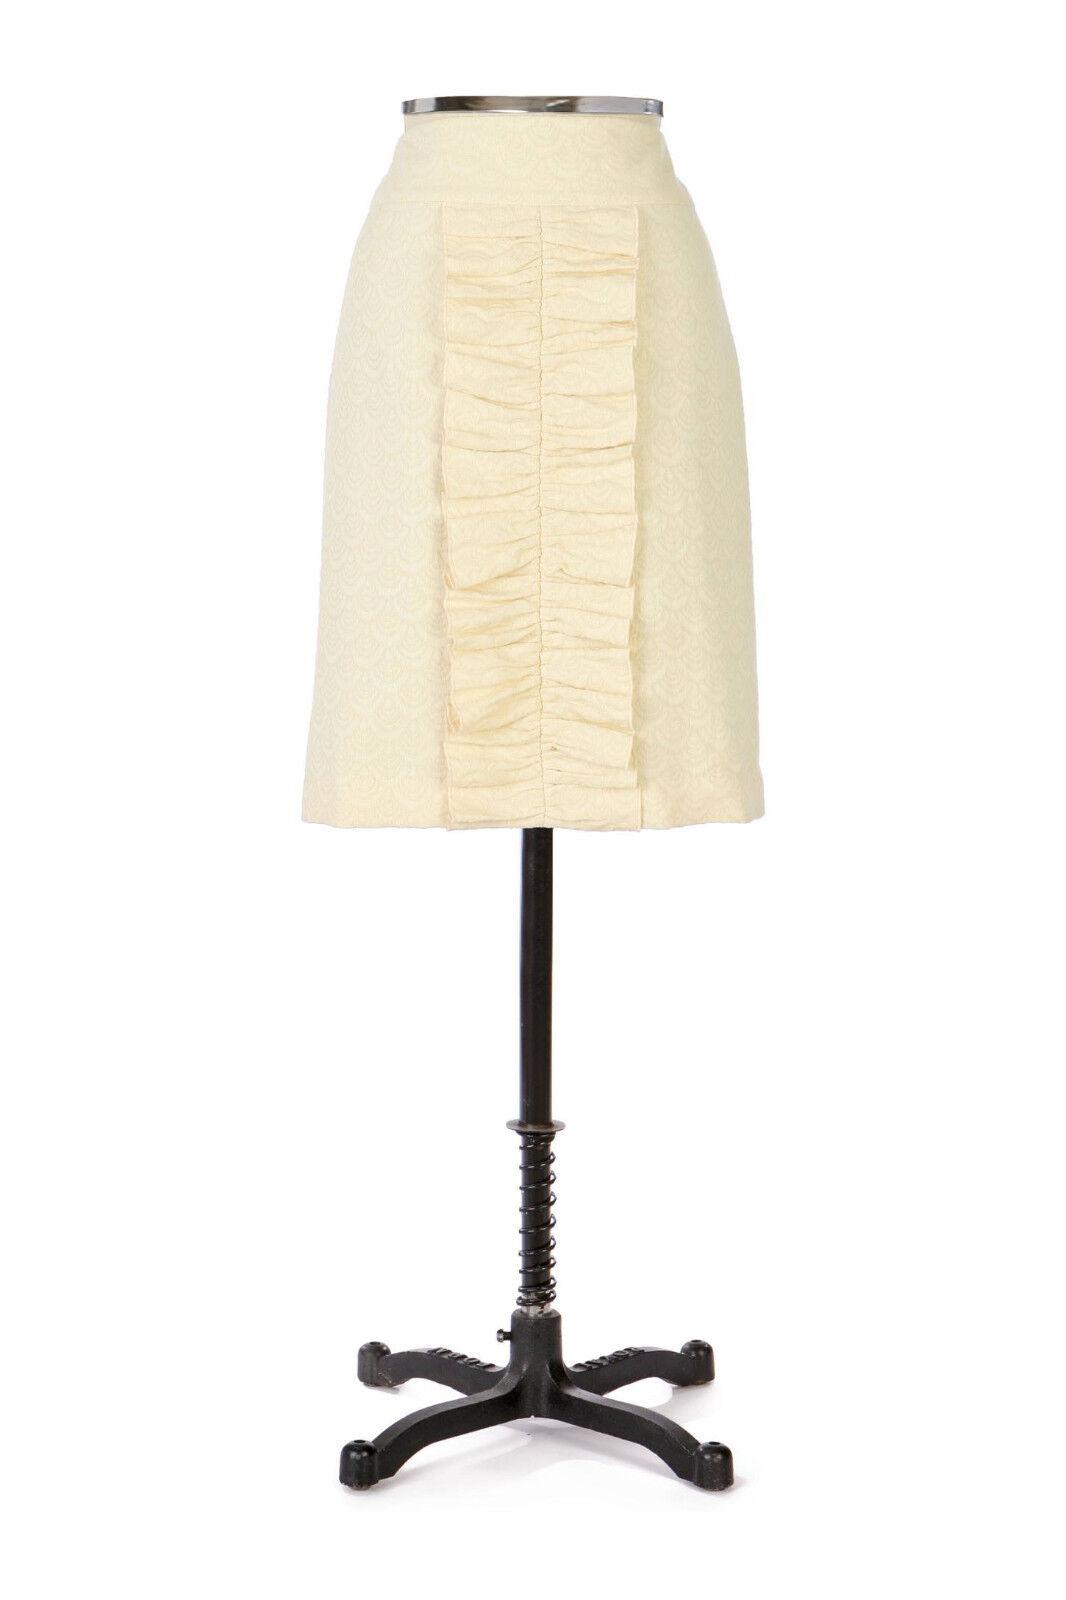 8 RARE Anthropologie Leifsdottir Jacquard Wool  Ruffle Pencil Skirt